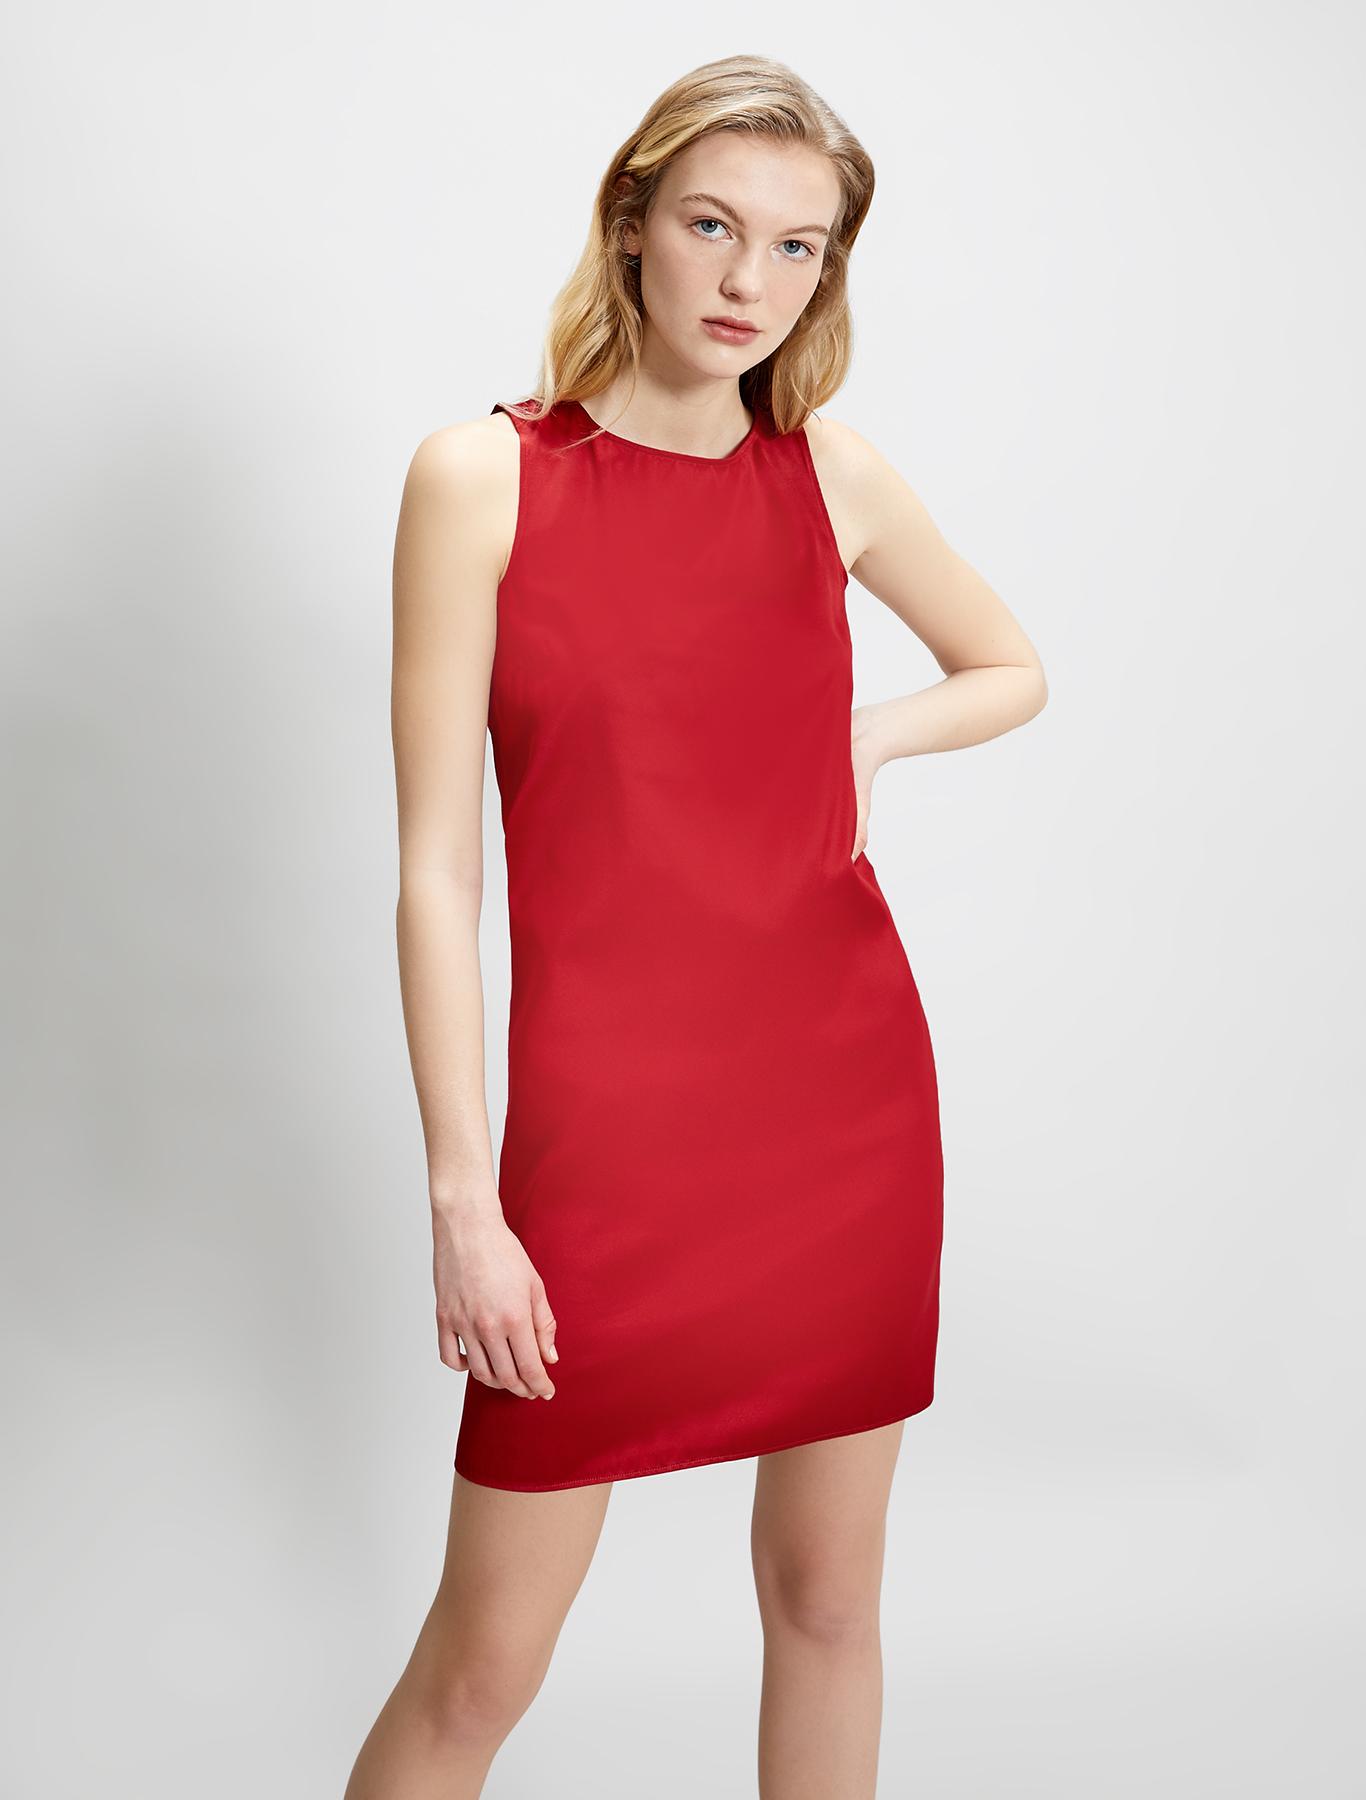 Taffeta sheath dress - red - pennyblack